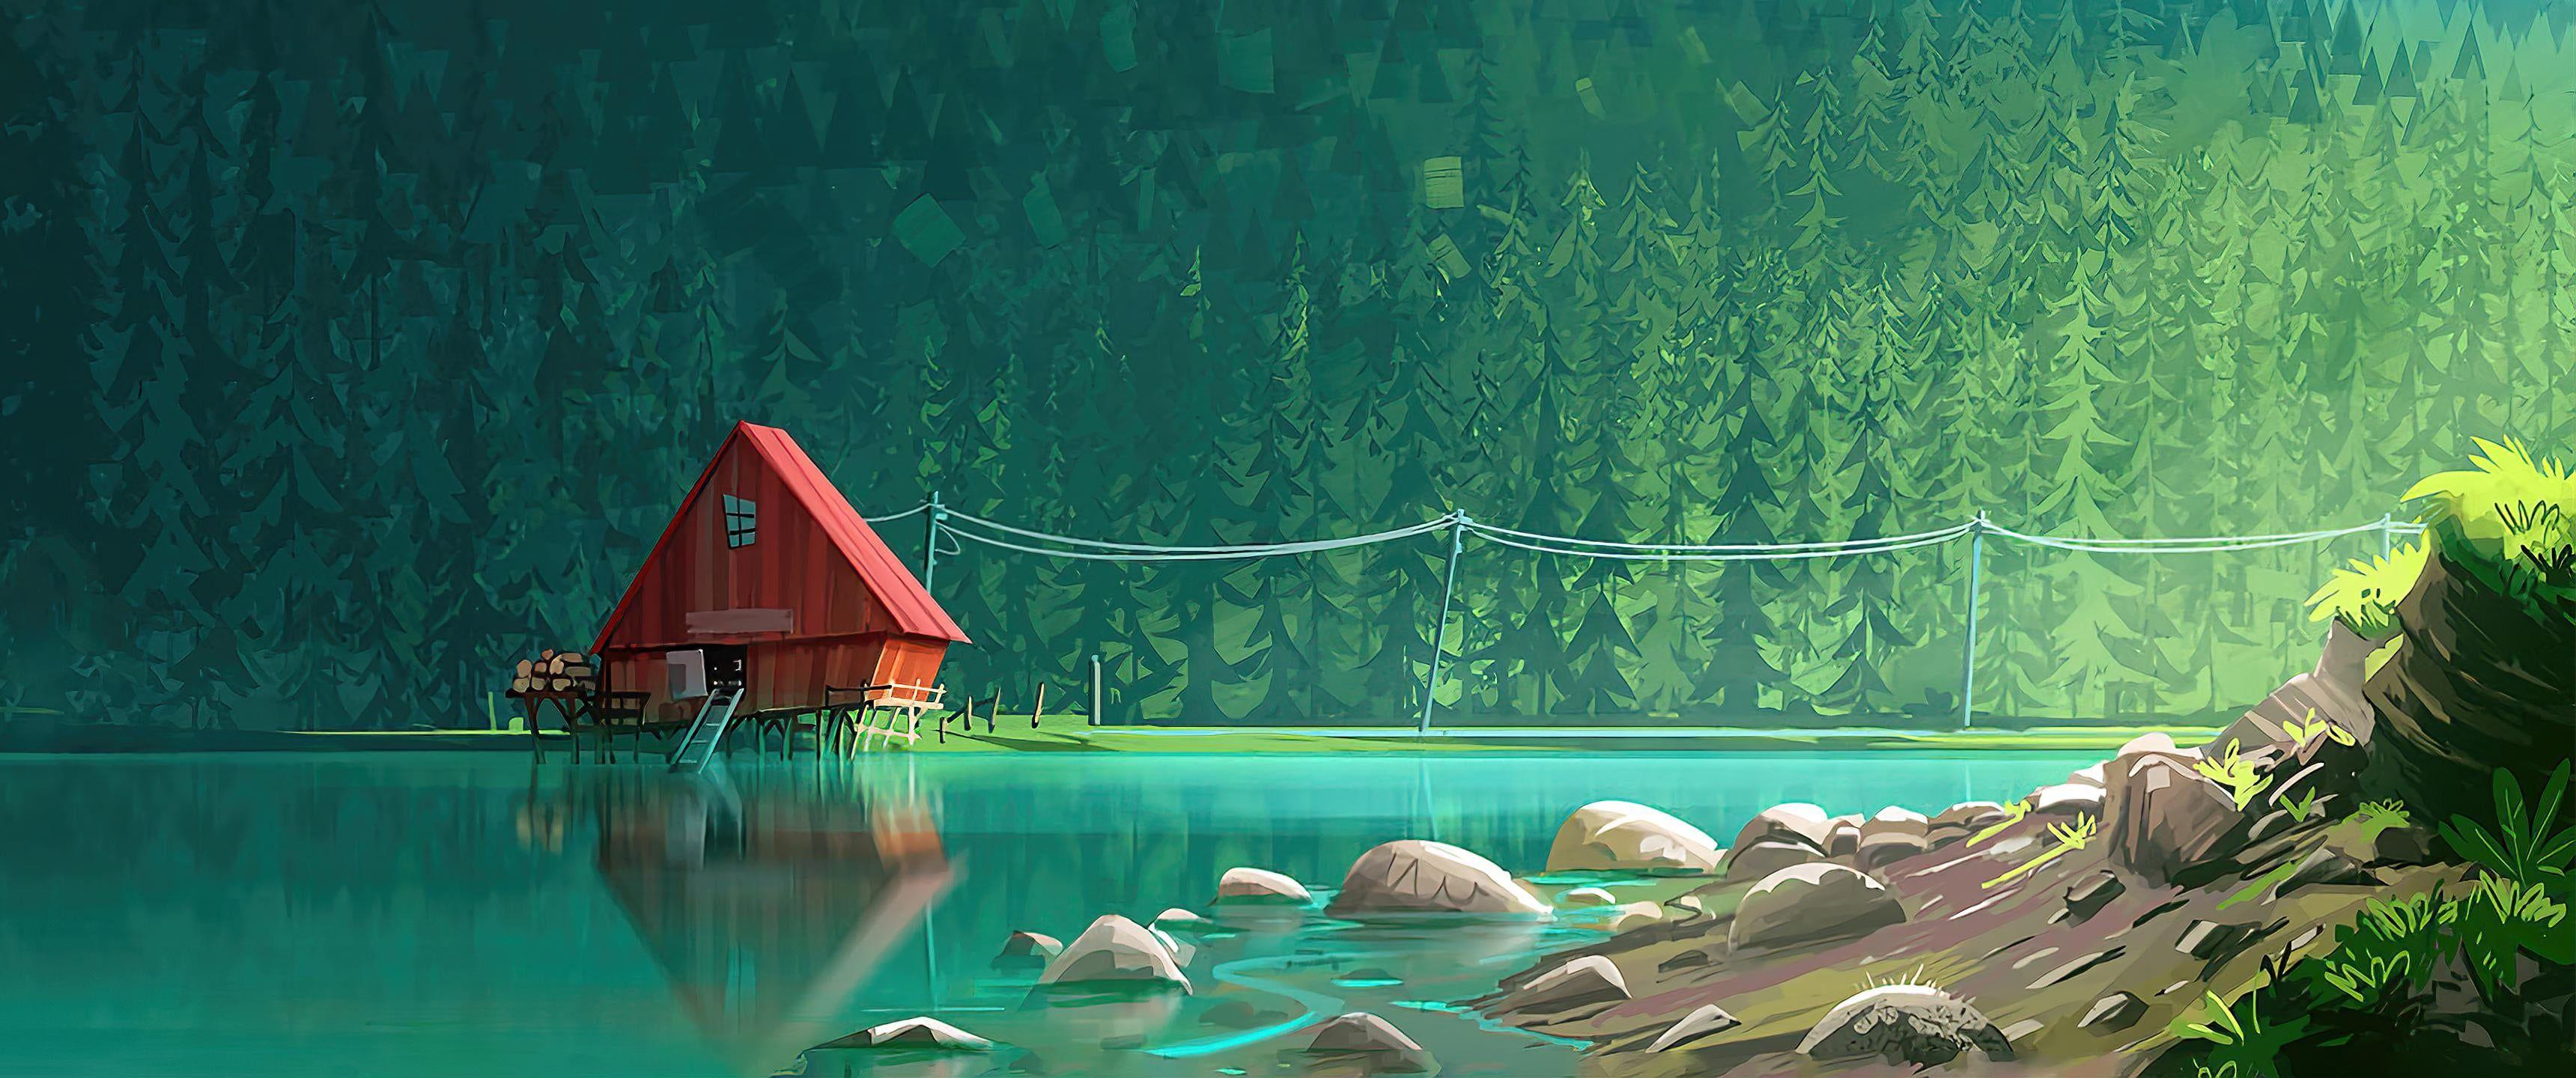 3440 X 1440 Forest Lake Minimalism Ultrawide Crop Forest Lake 3440x1440 Wallpaper Loki Wallpaper